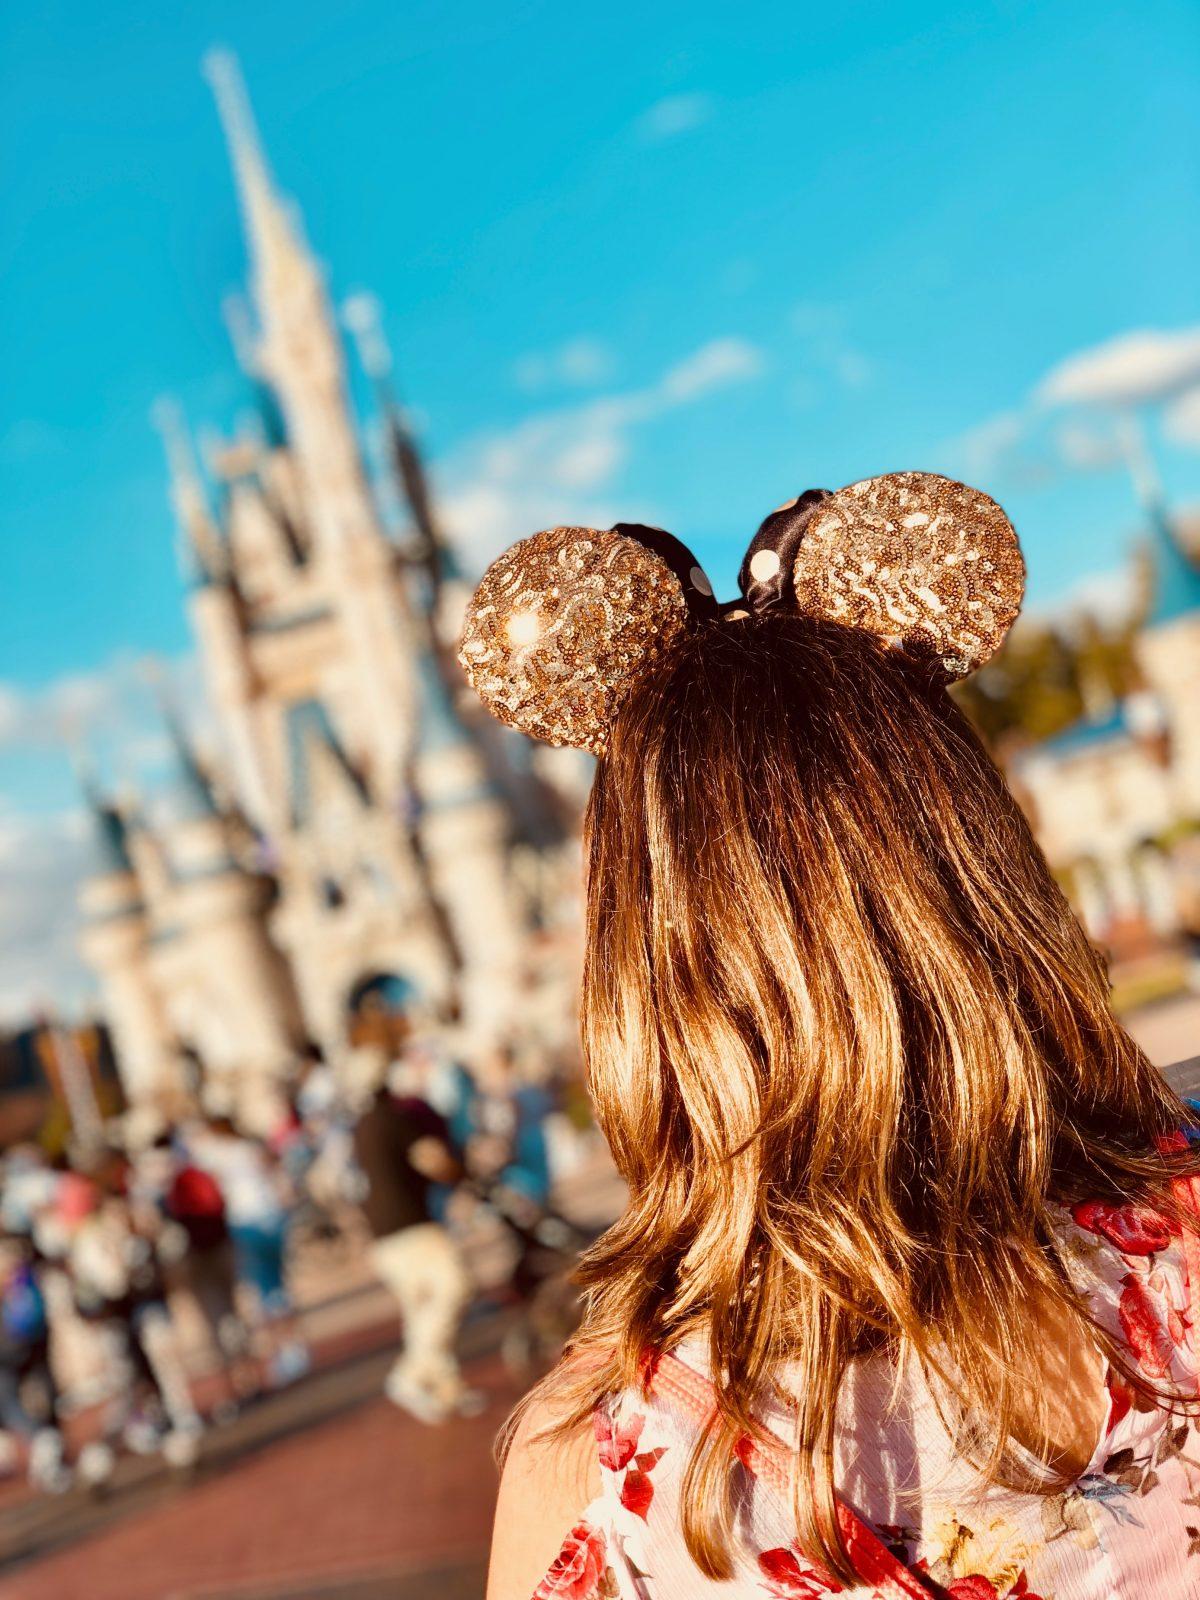 A sunny day for fun at Disneyland Tokyo